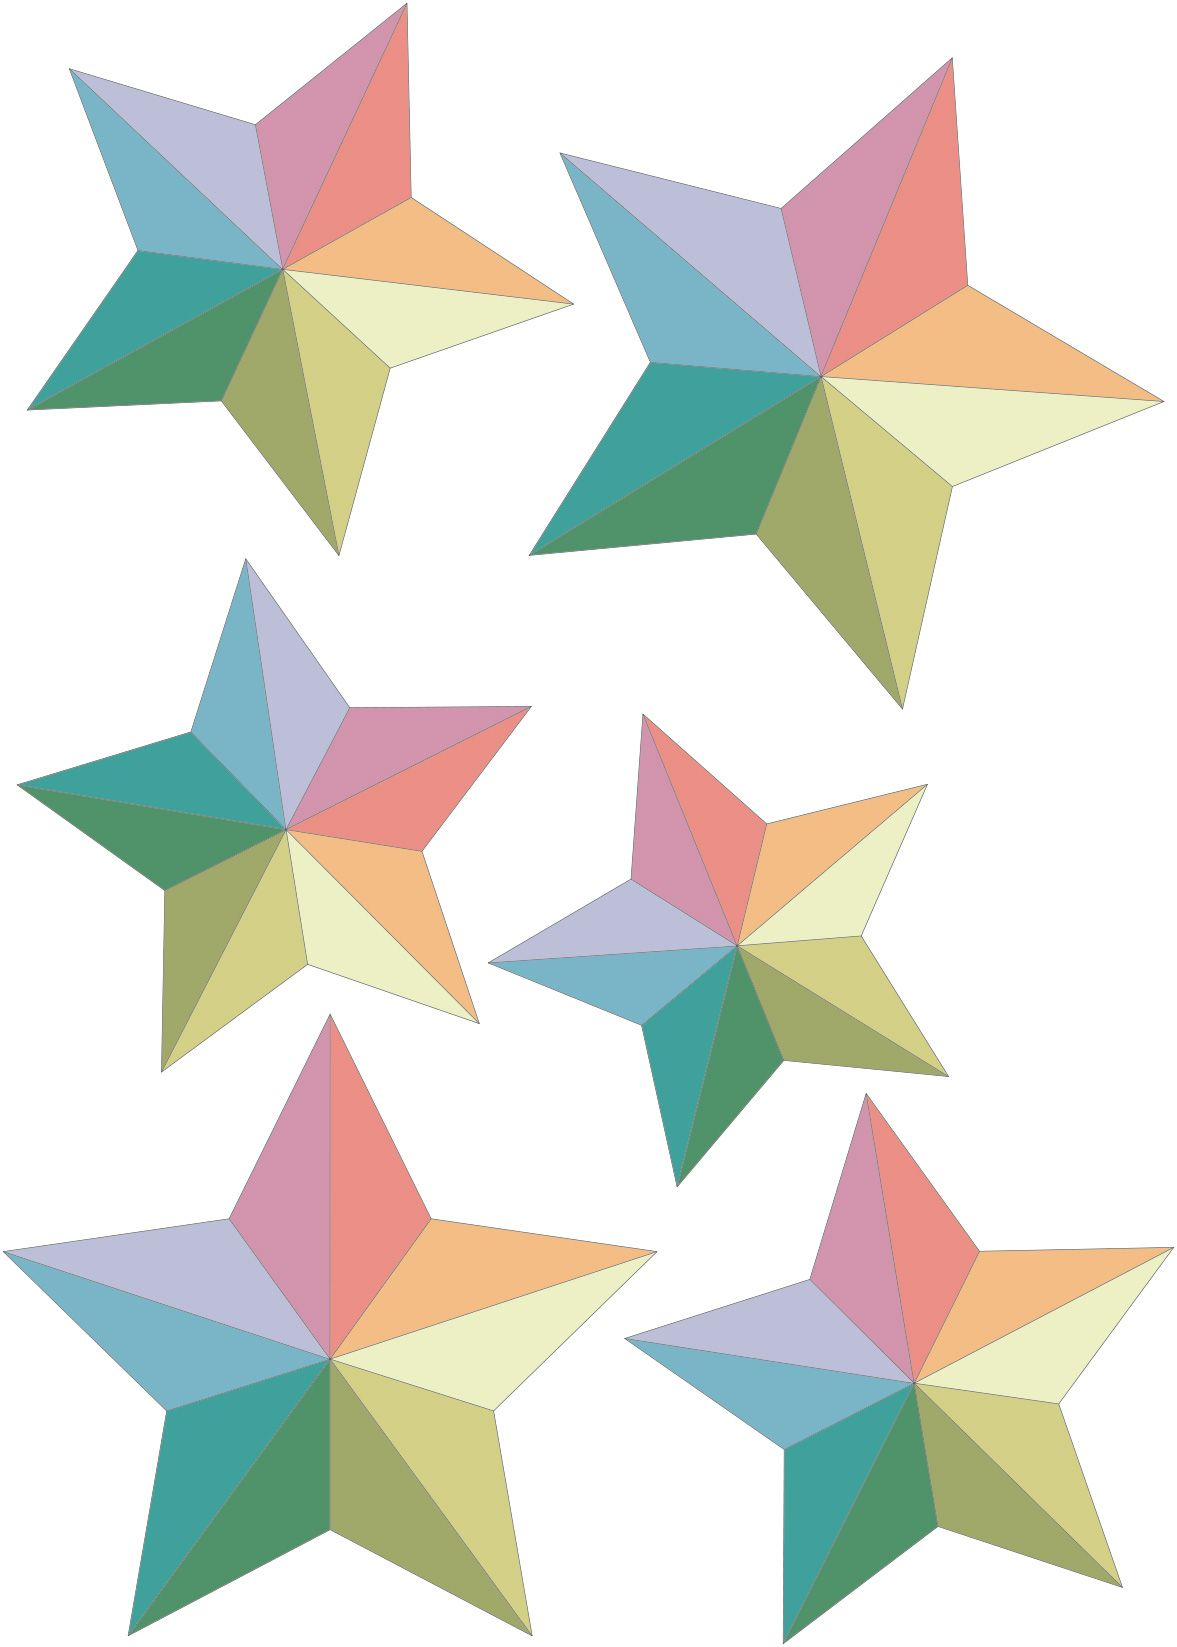 Etoiles-en-papier1.jpg (1177×1647)